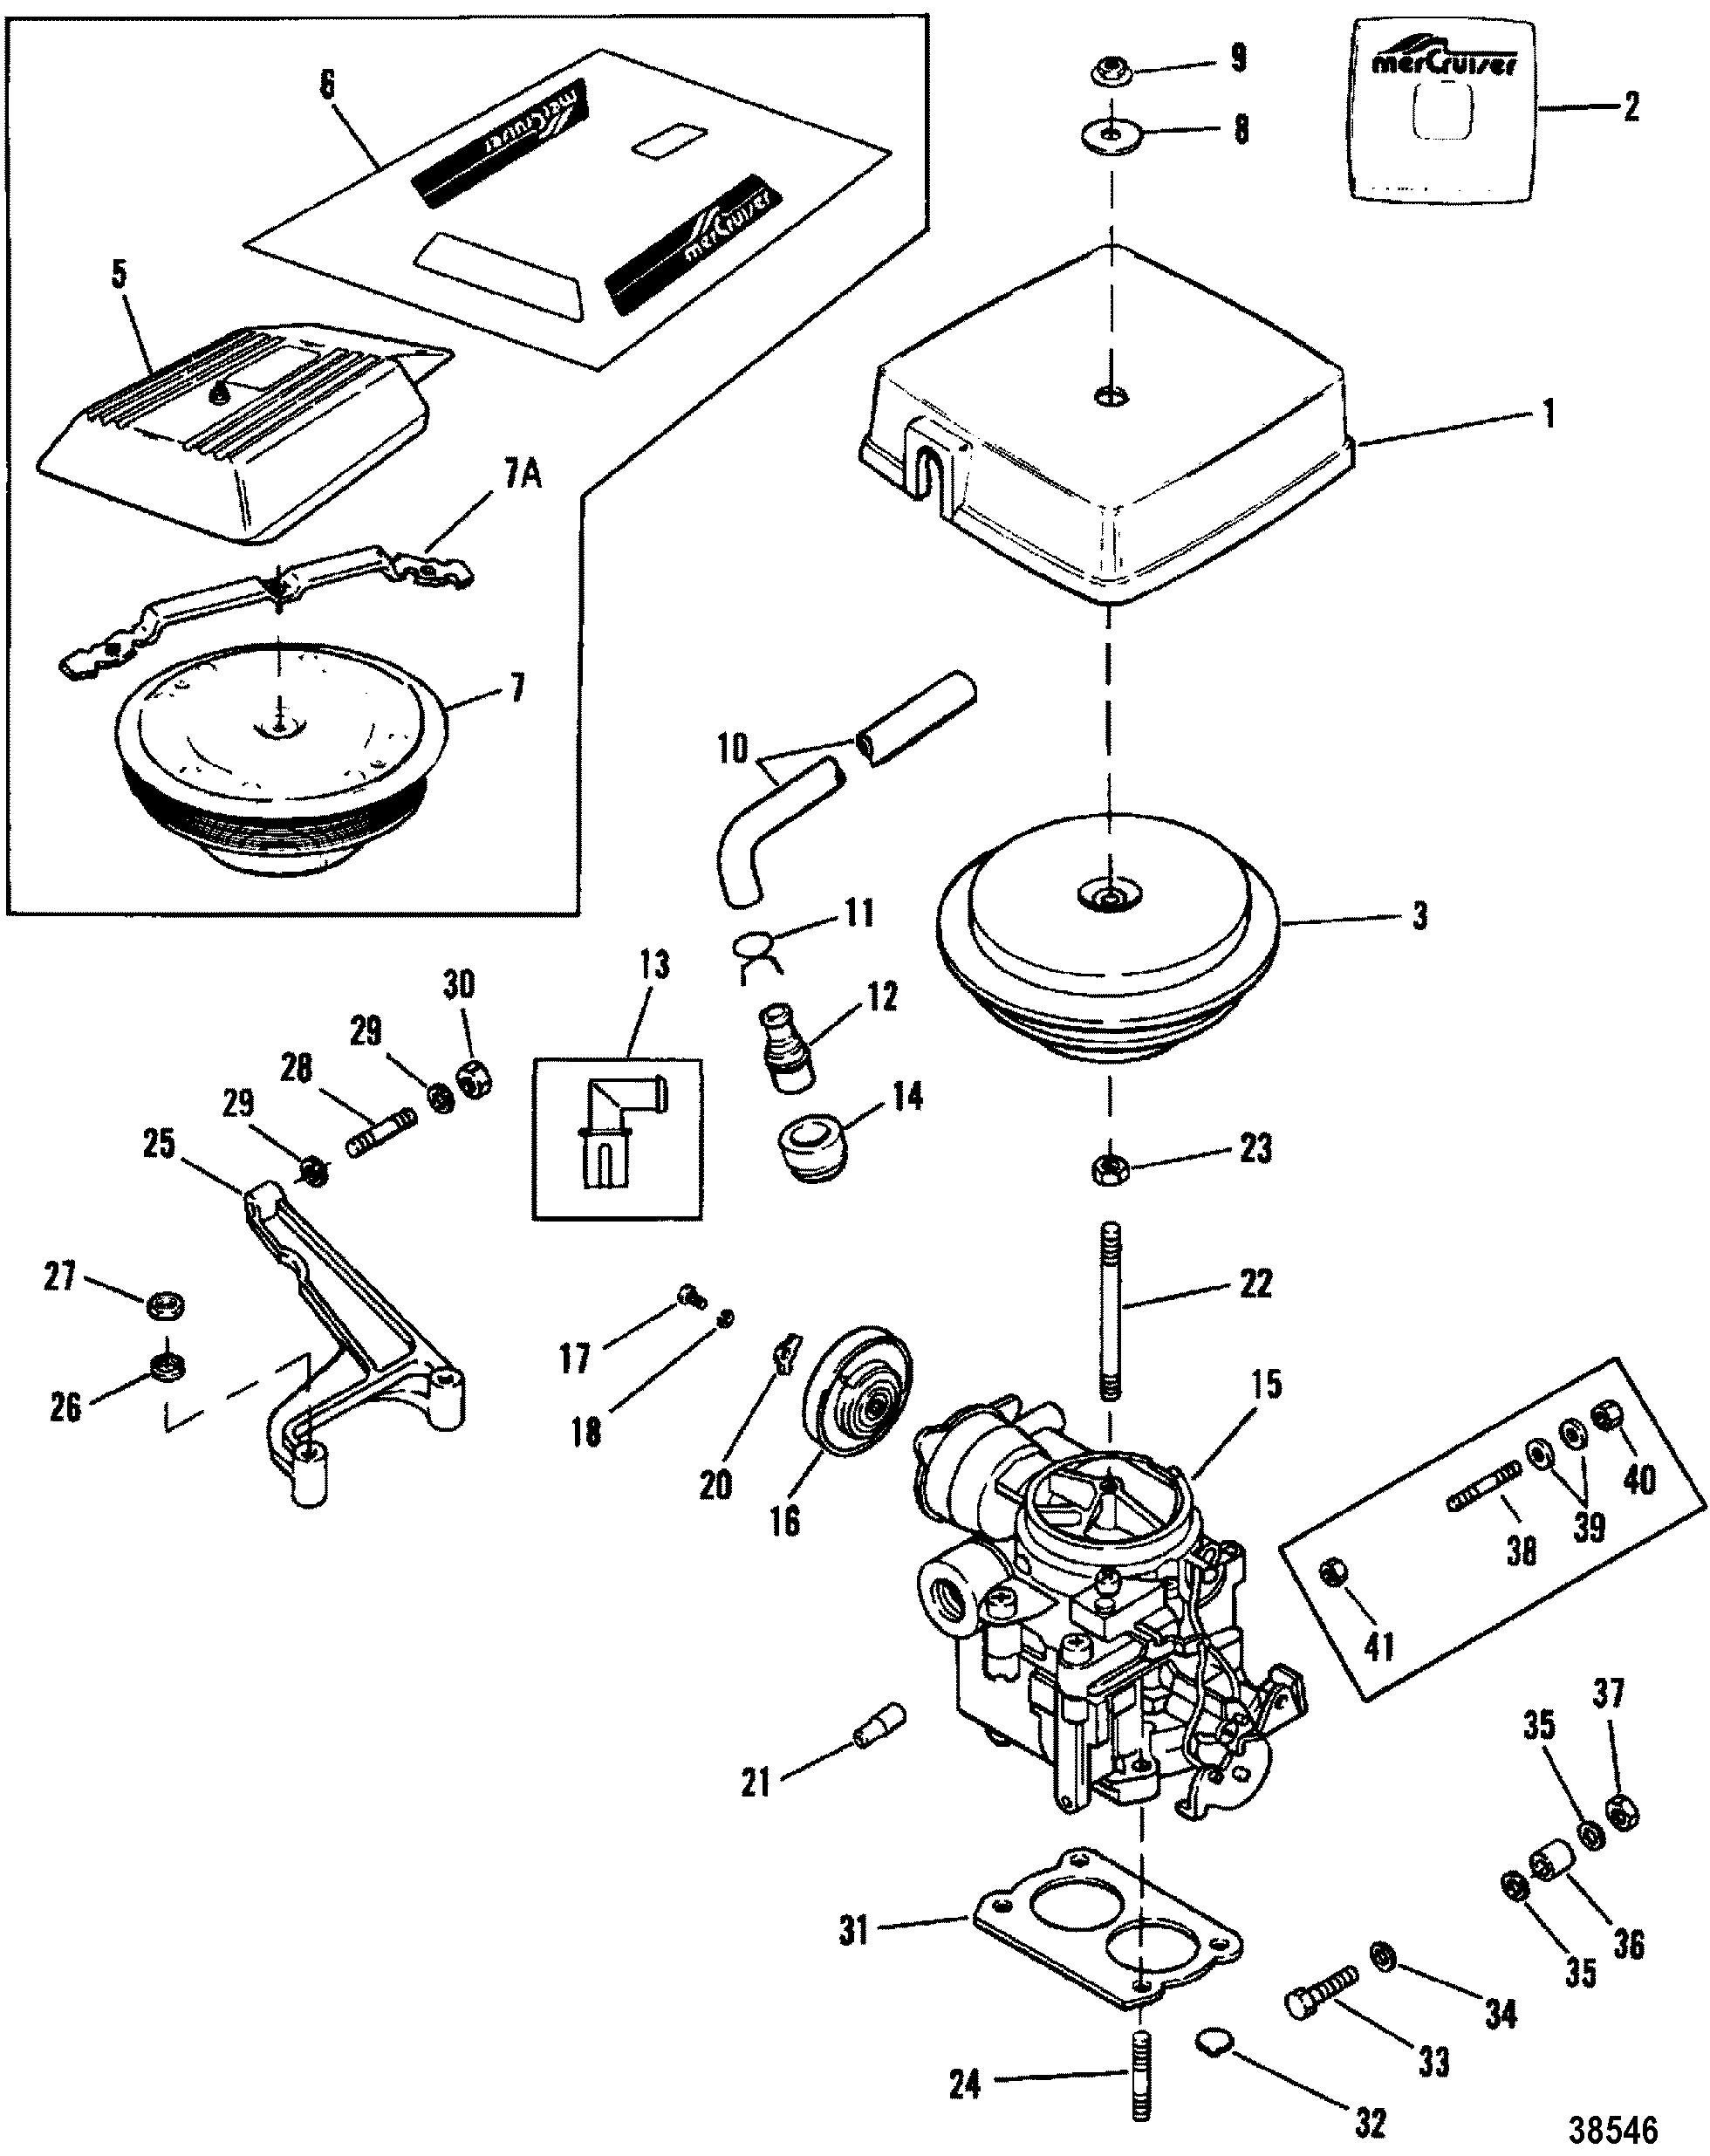 mercruiser 260 alternator wiring diagram 2000 ford explorer suspension 350 engine my